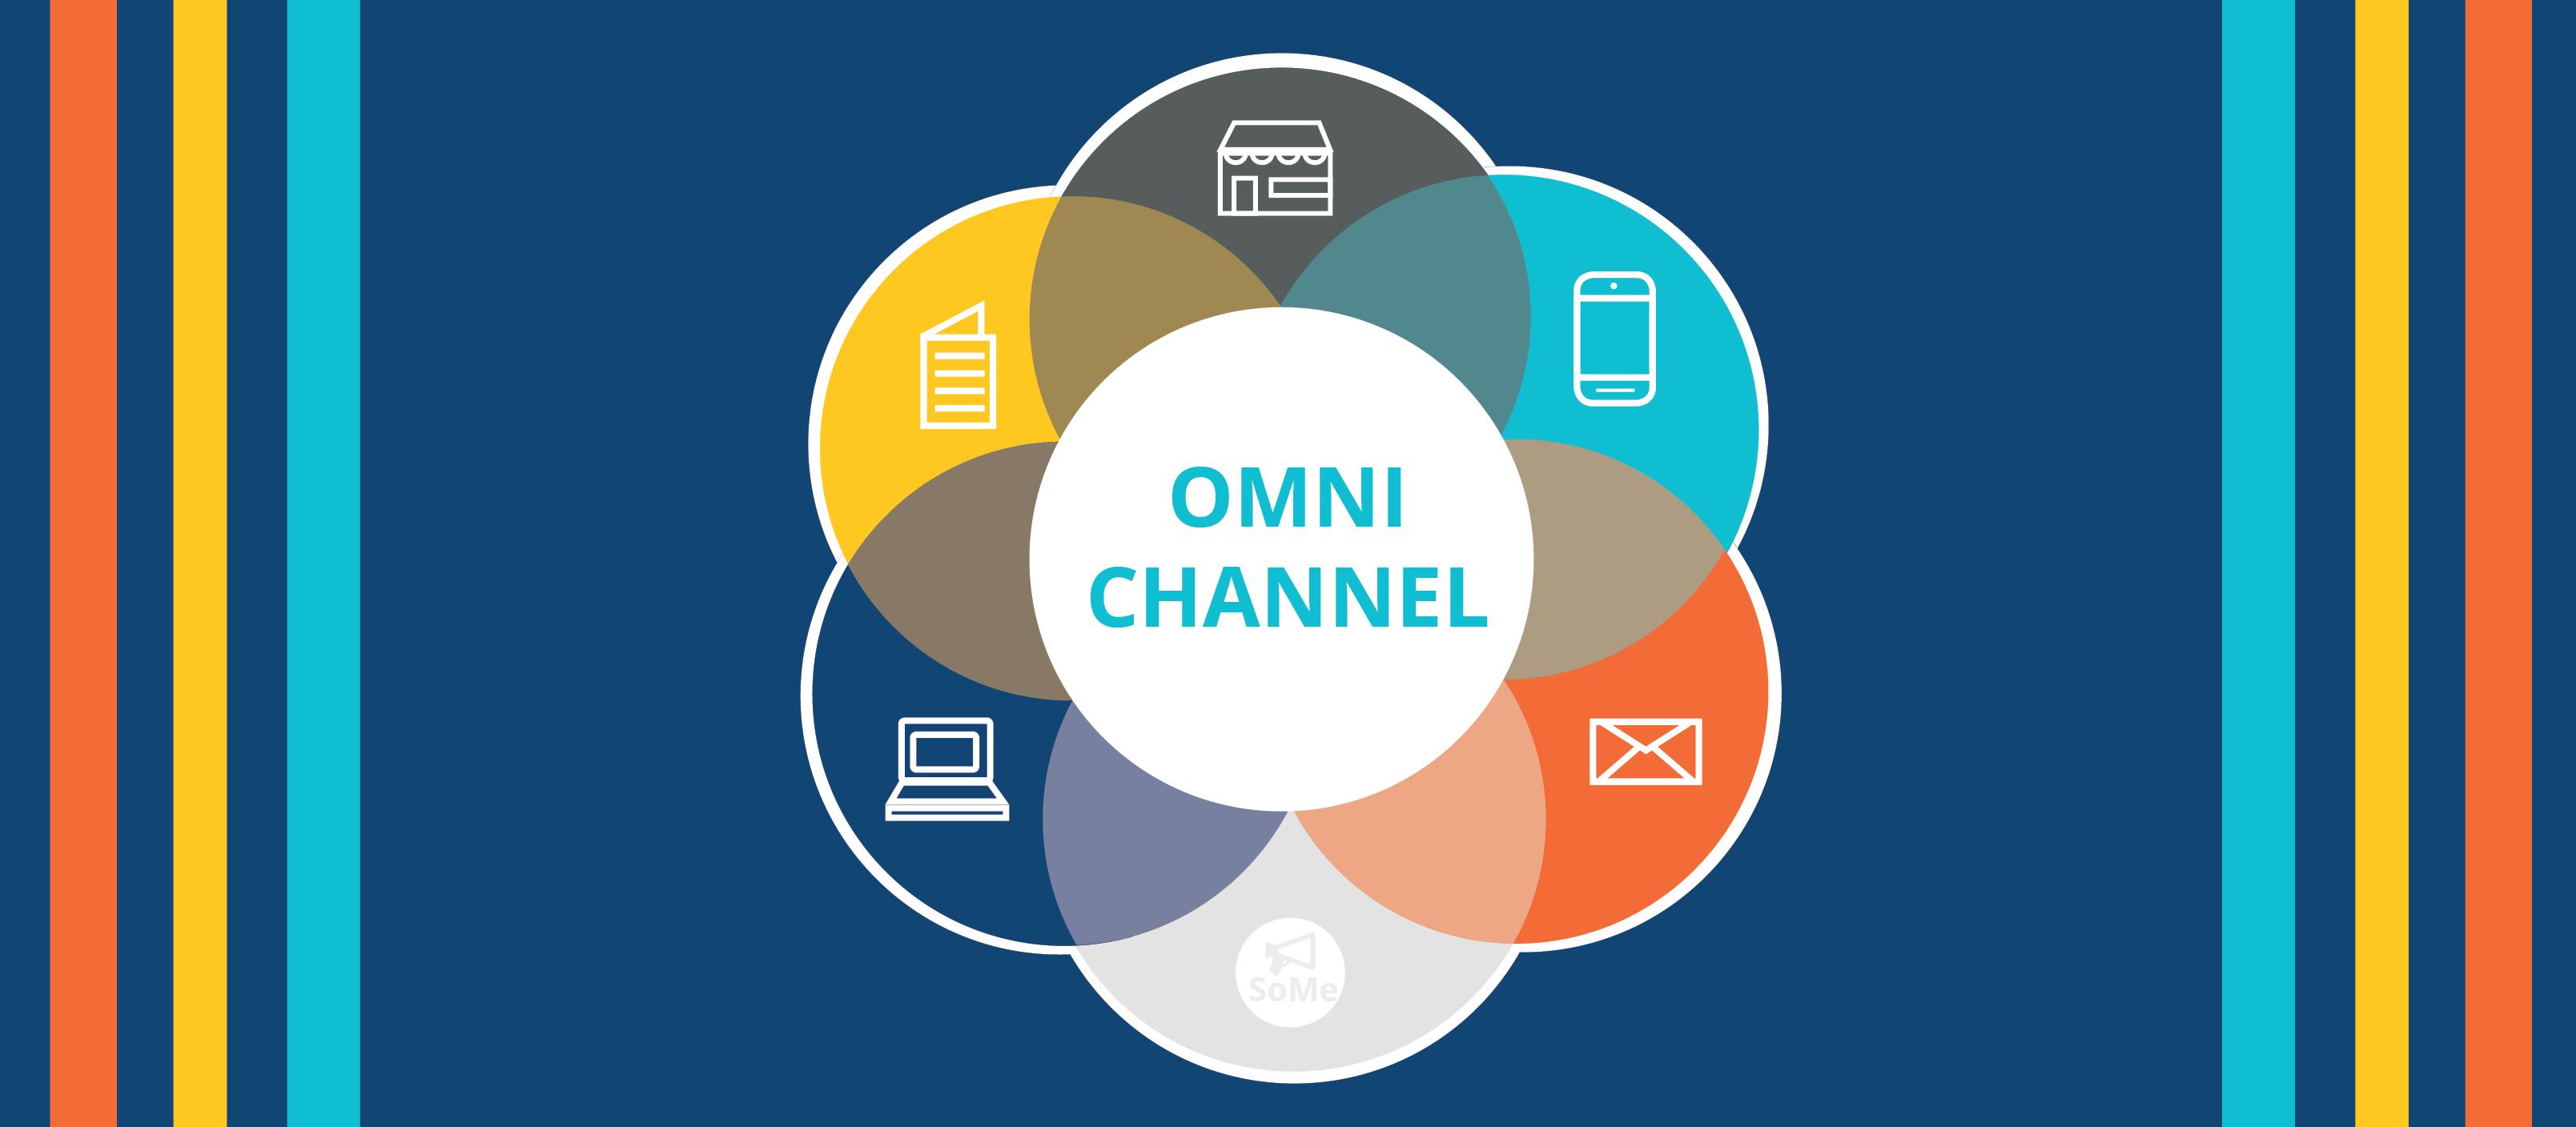 Omnichannel: A Short Introduction